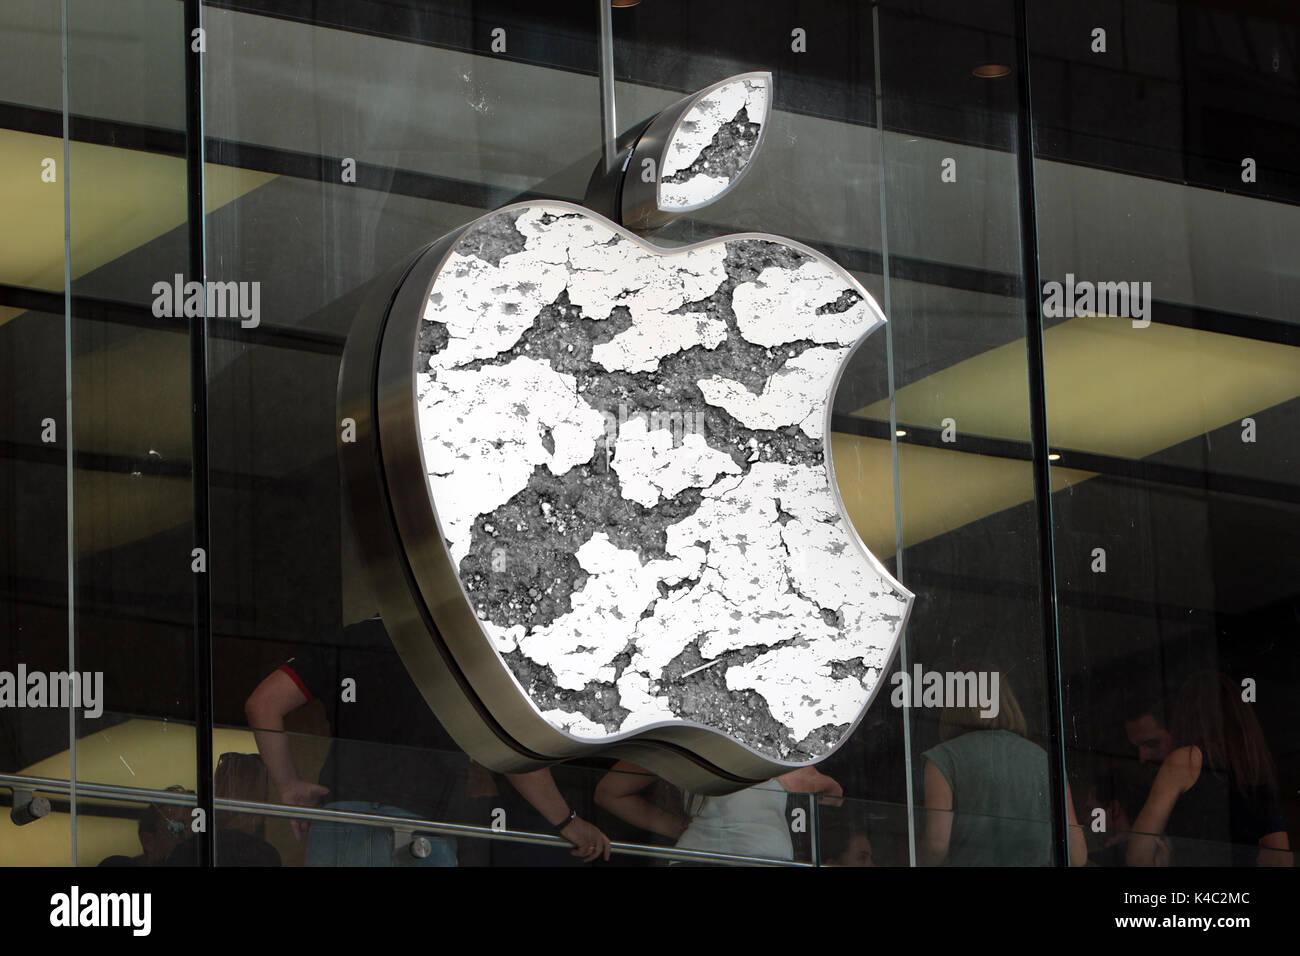 Eroding Apple Sign Stock Photo